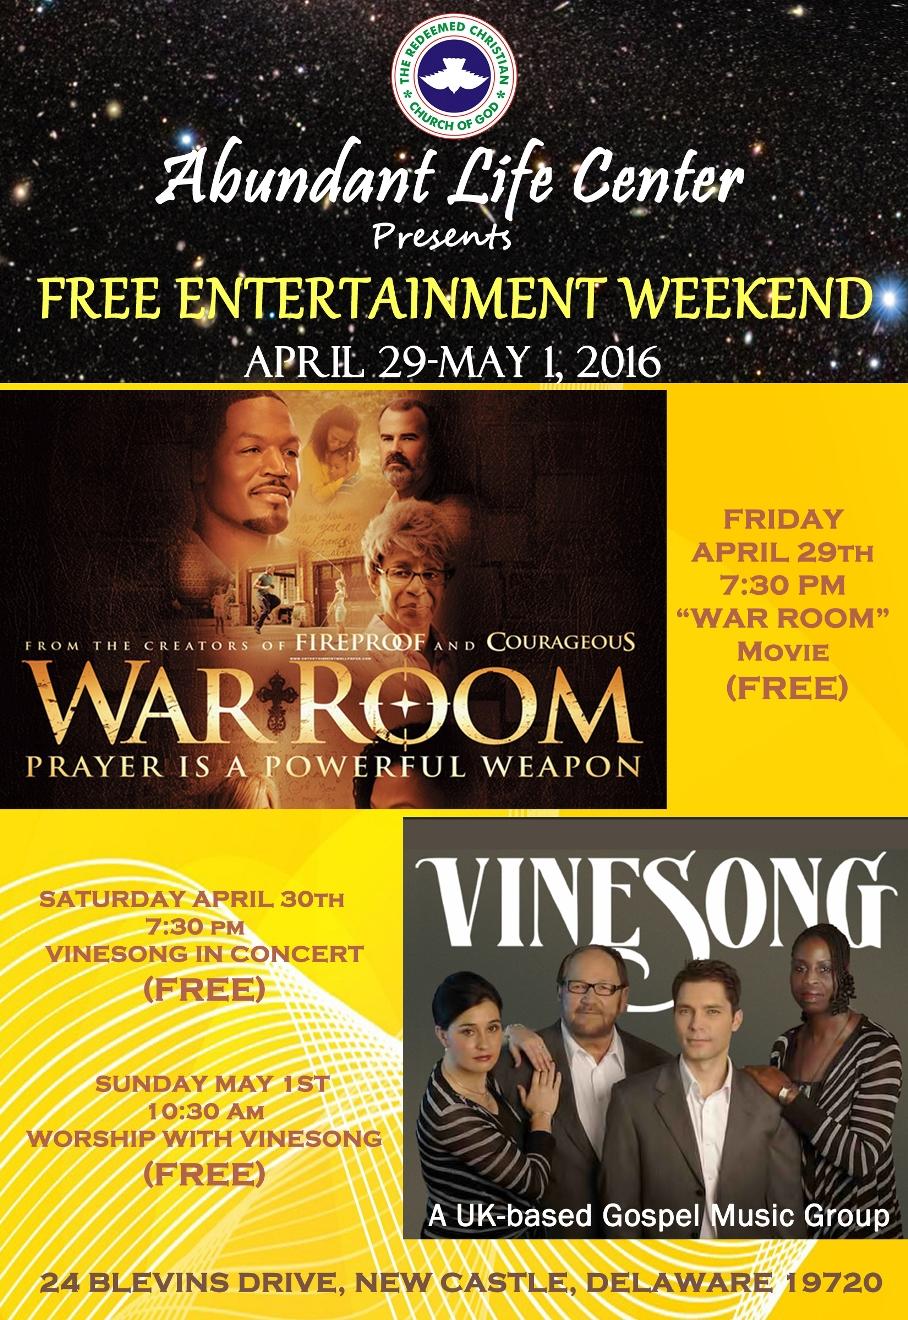 Free Entertainment Weekend